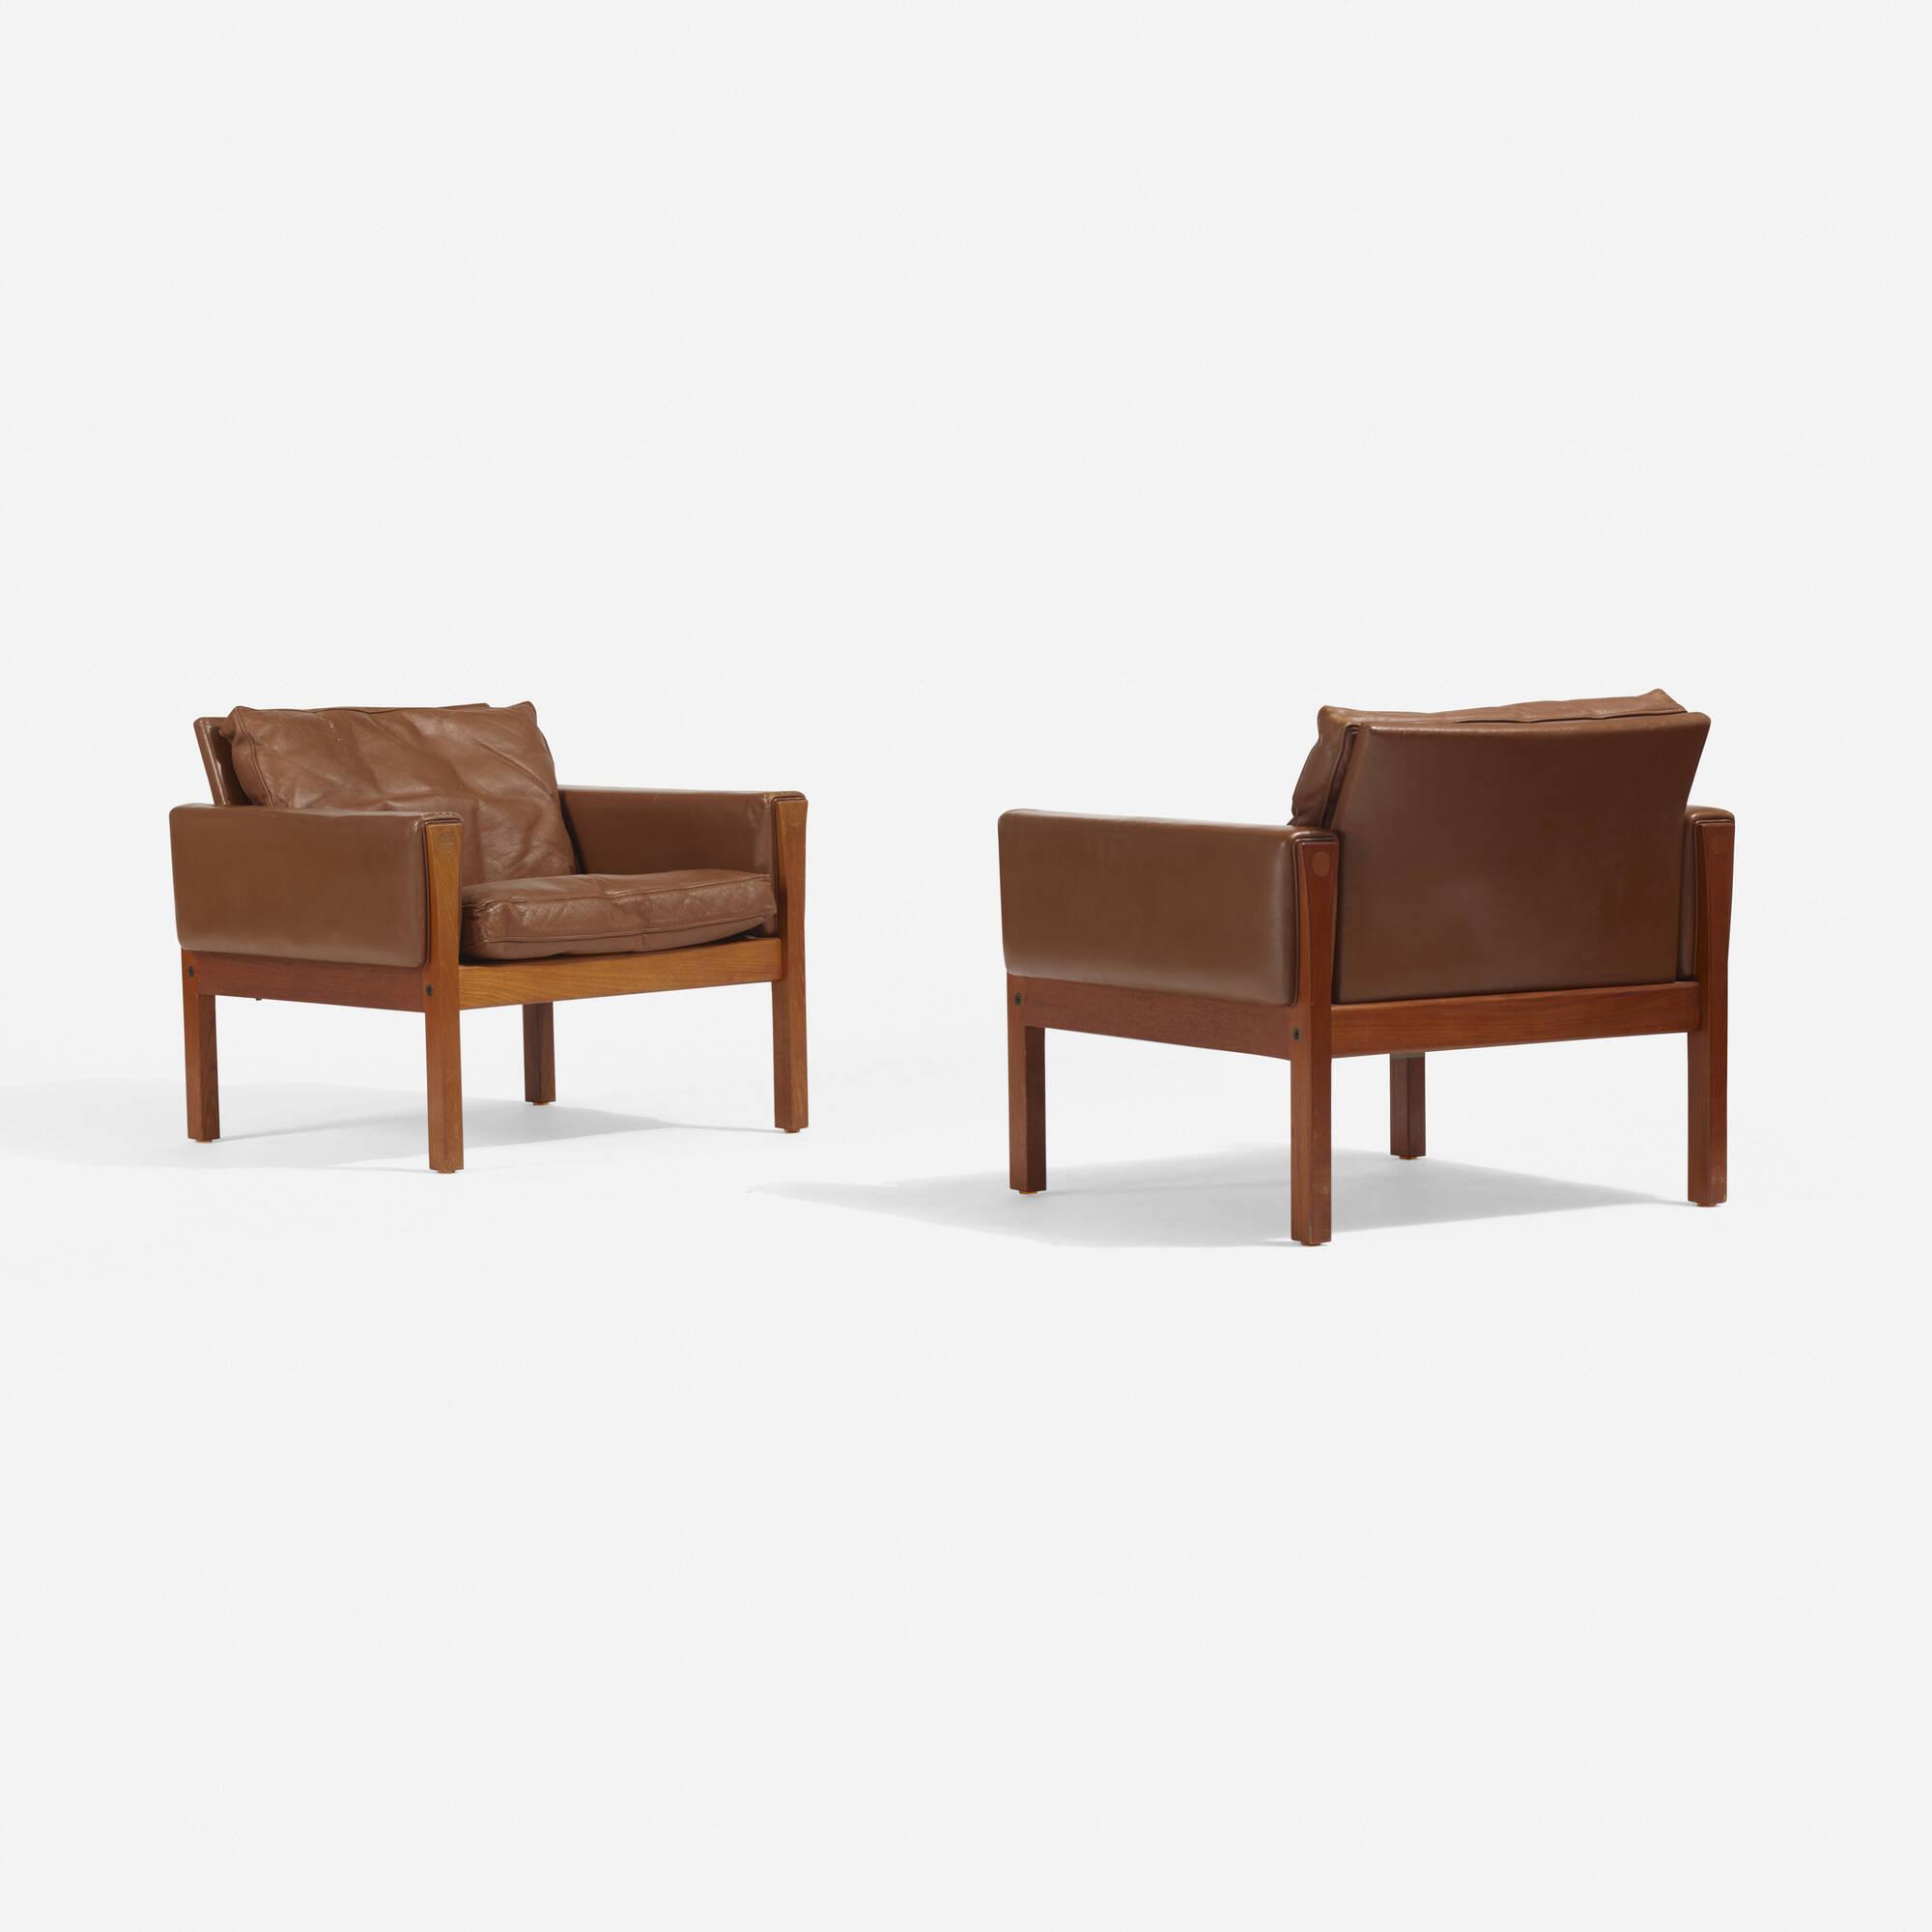 204: Hans J. Wegner / Lounge Chairs Model AP62, Pair (2 Of 3) ...